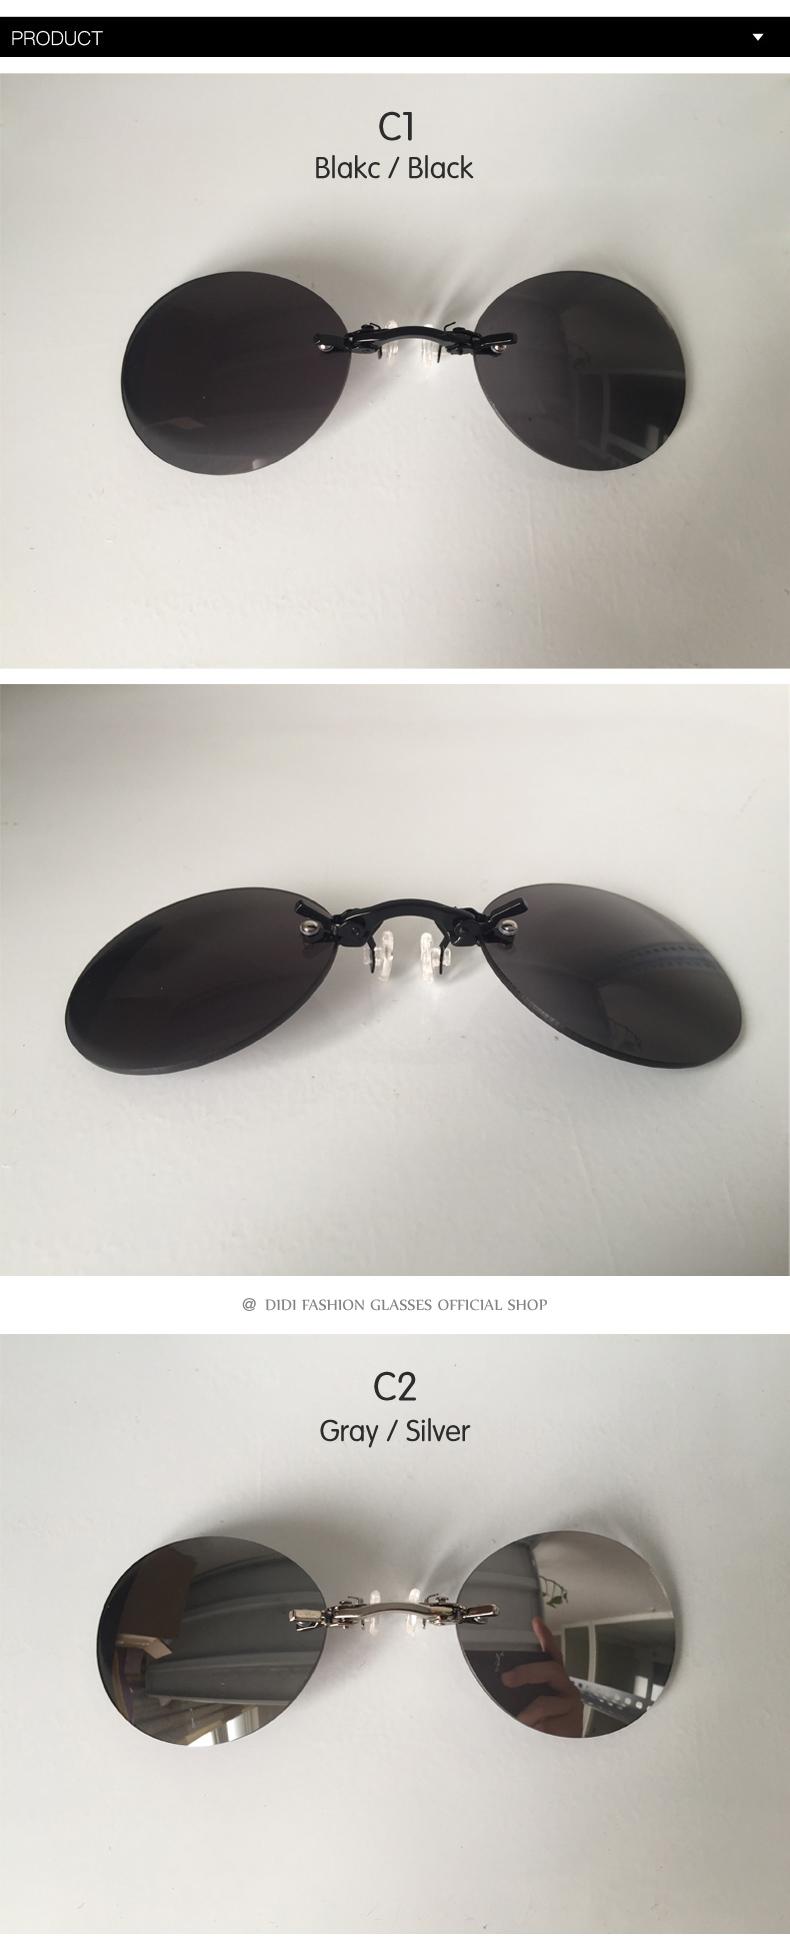 HTB1eykIdbsTMeJjSszgq6ycpFXa1 - DIDI Small Round Clip On Nose Mini Sunglasses Men Brand Cool Steampunk Sun Glasses Women Vintage Metal Black Coating Gafas H689